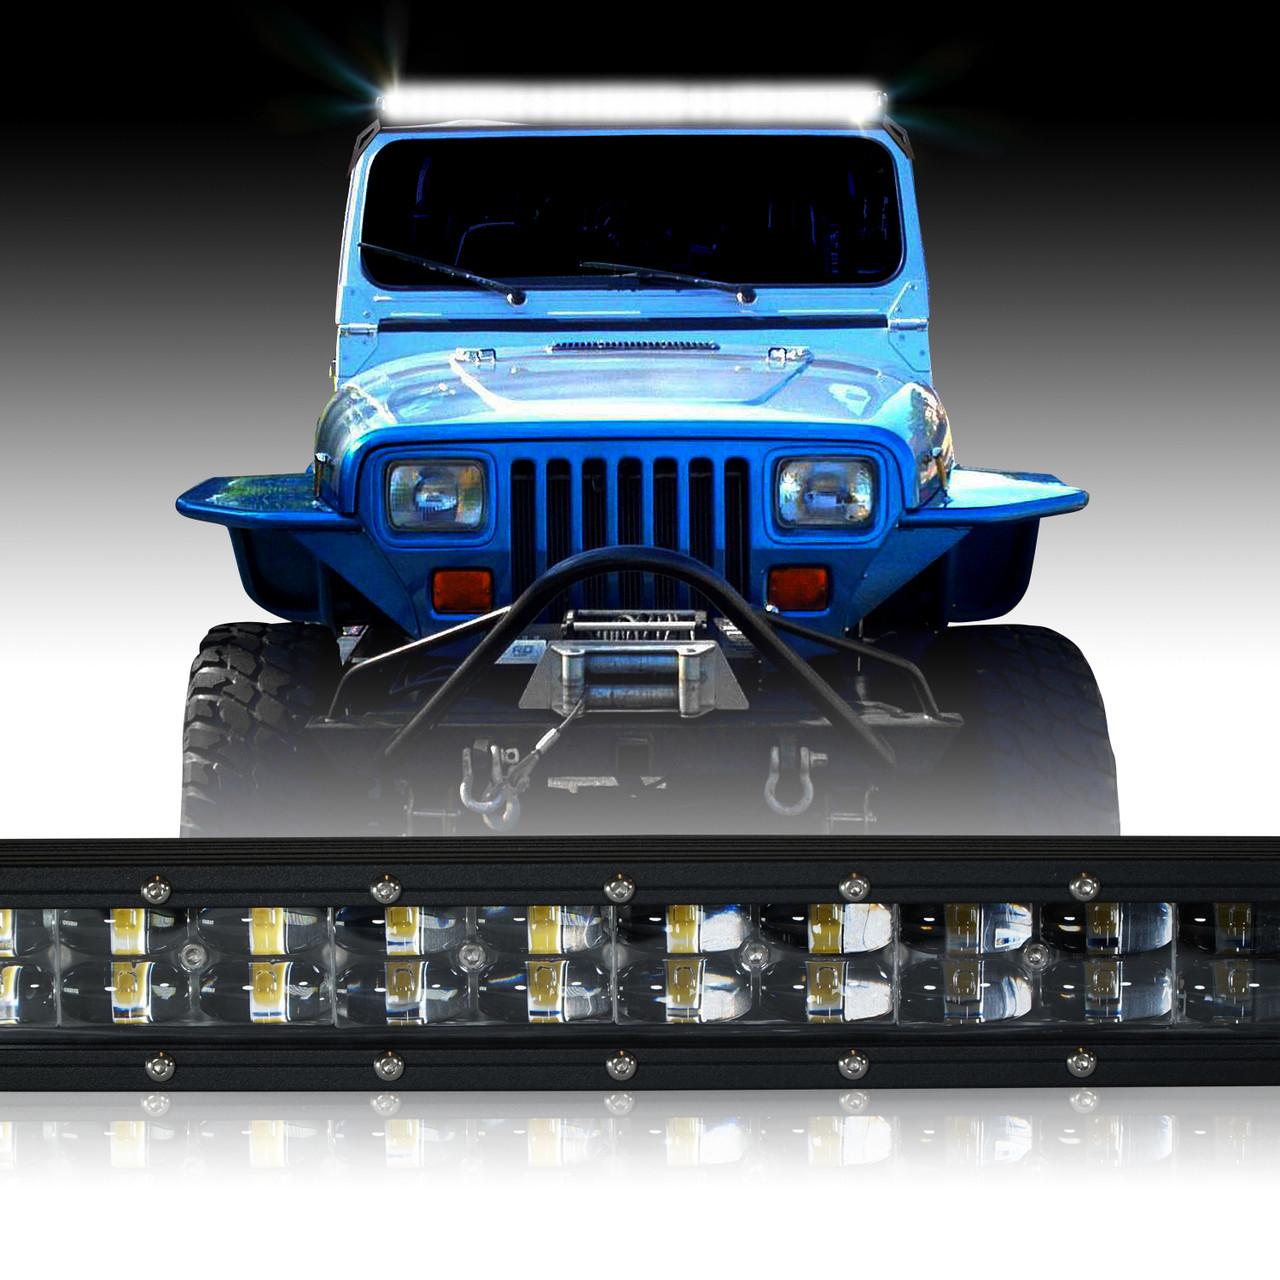 Jeep Wrangler Turn Signal Wiring Harness on jeep wrangler windshield, jeep wrangler wheels, jeep wrangler water pump,